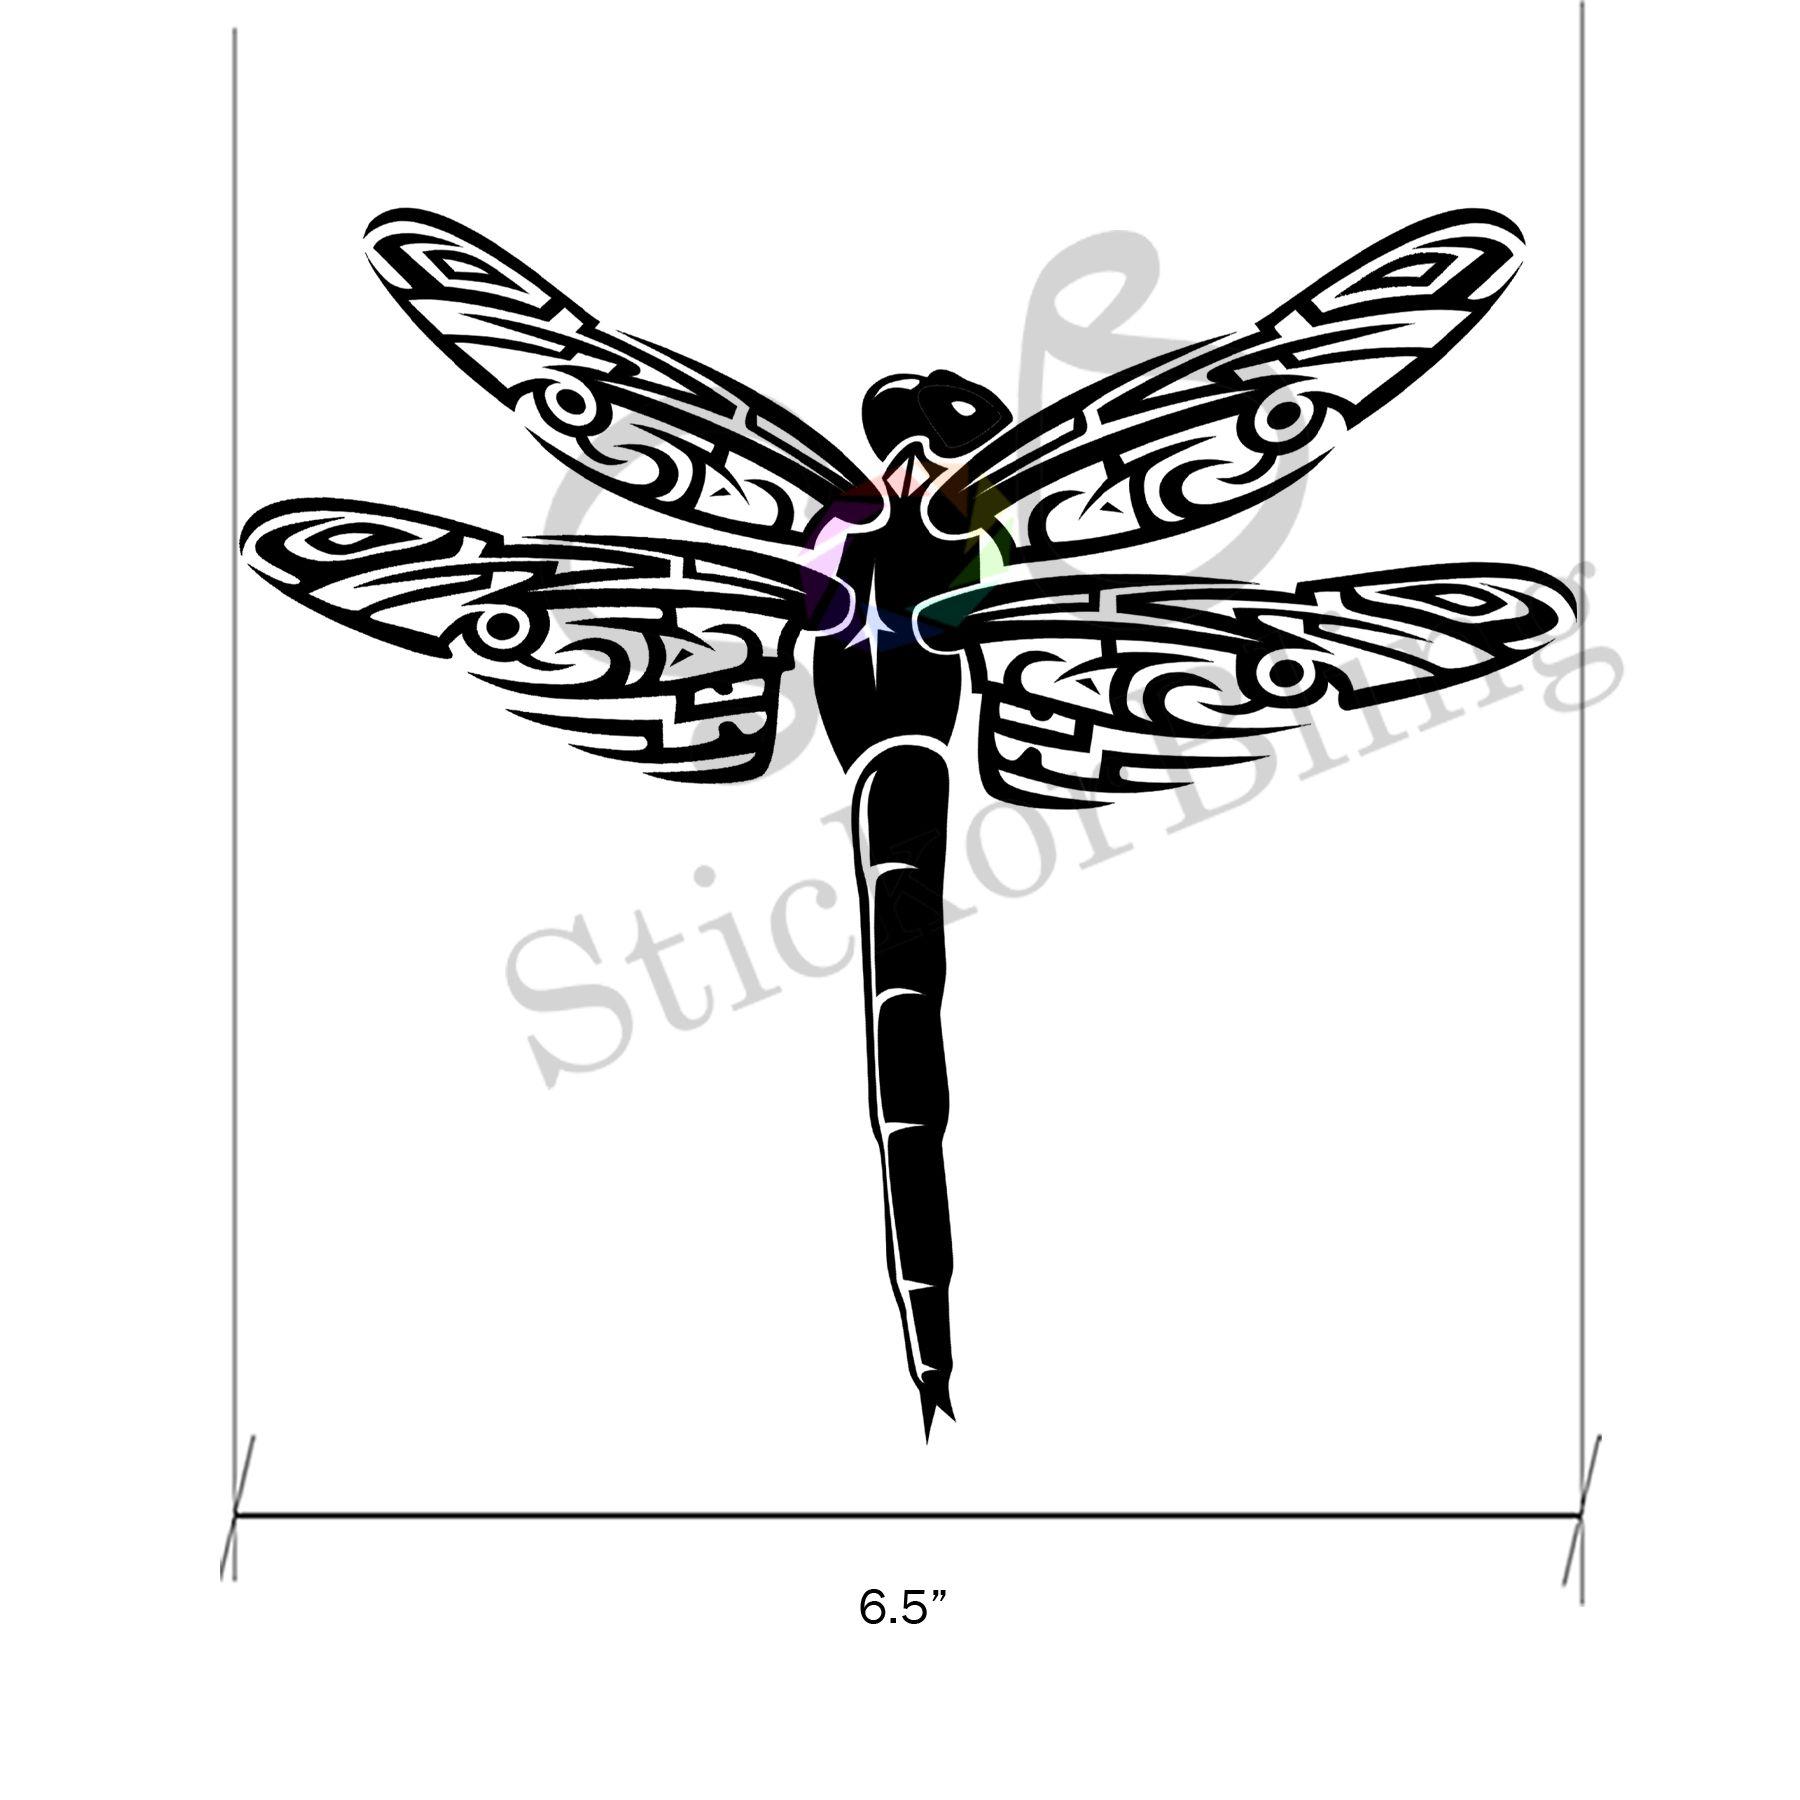 Dragonfly Tribal Die Cut Vinyl Decal Sticker Car Window - Die cut vinyl decal stickers